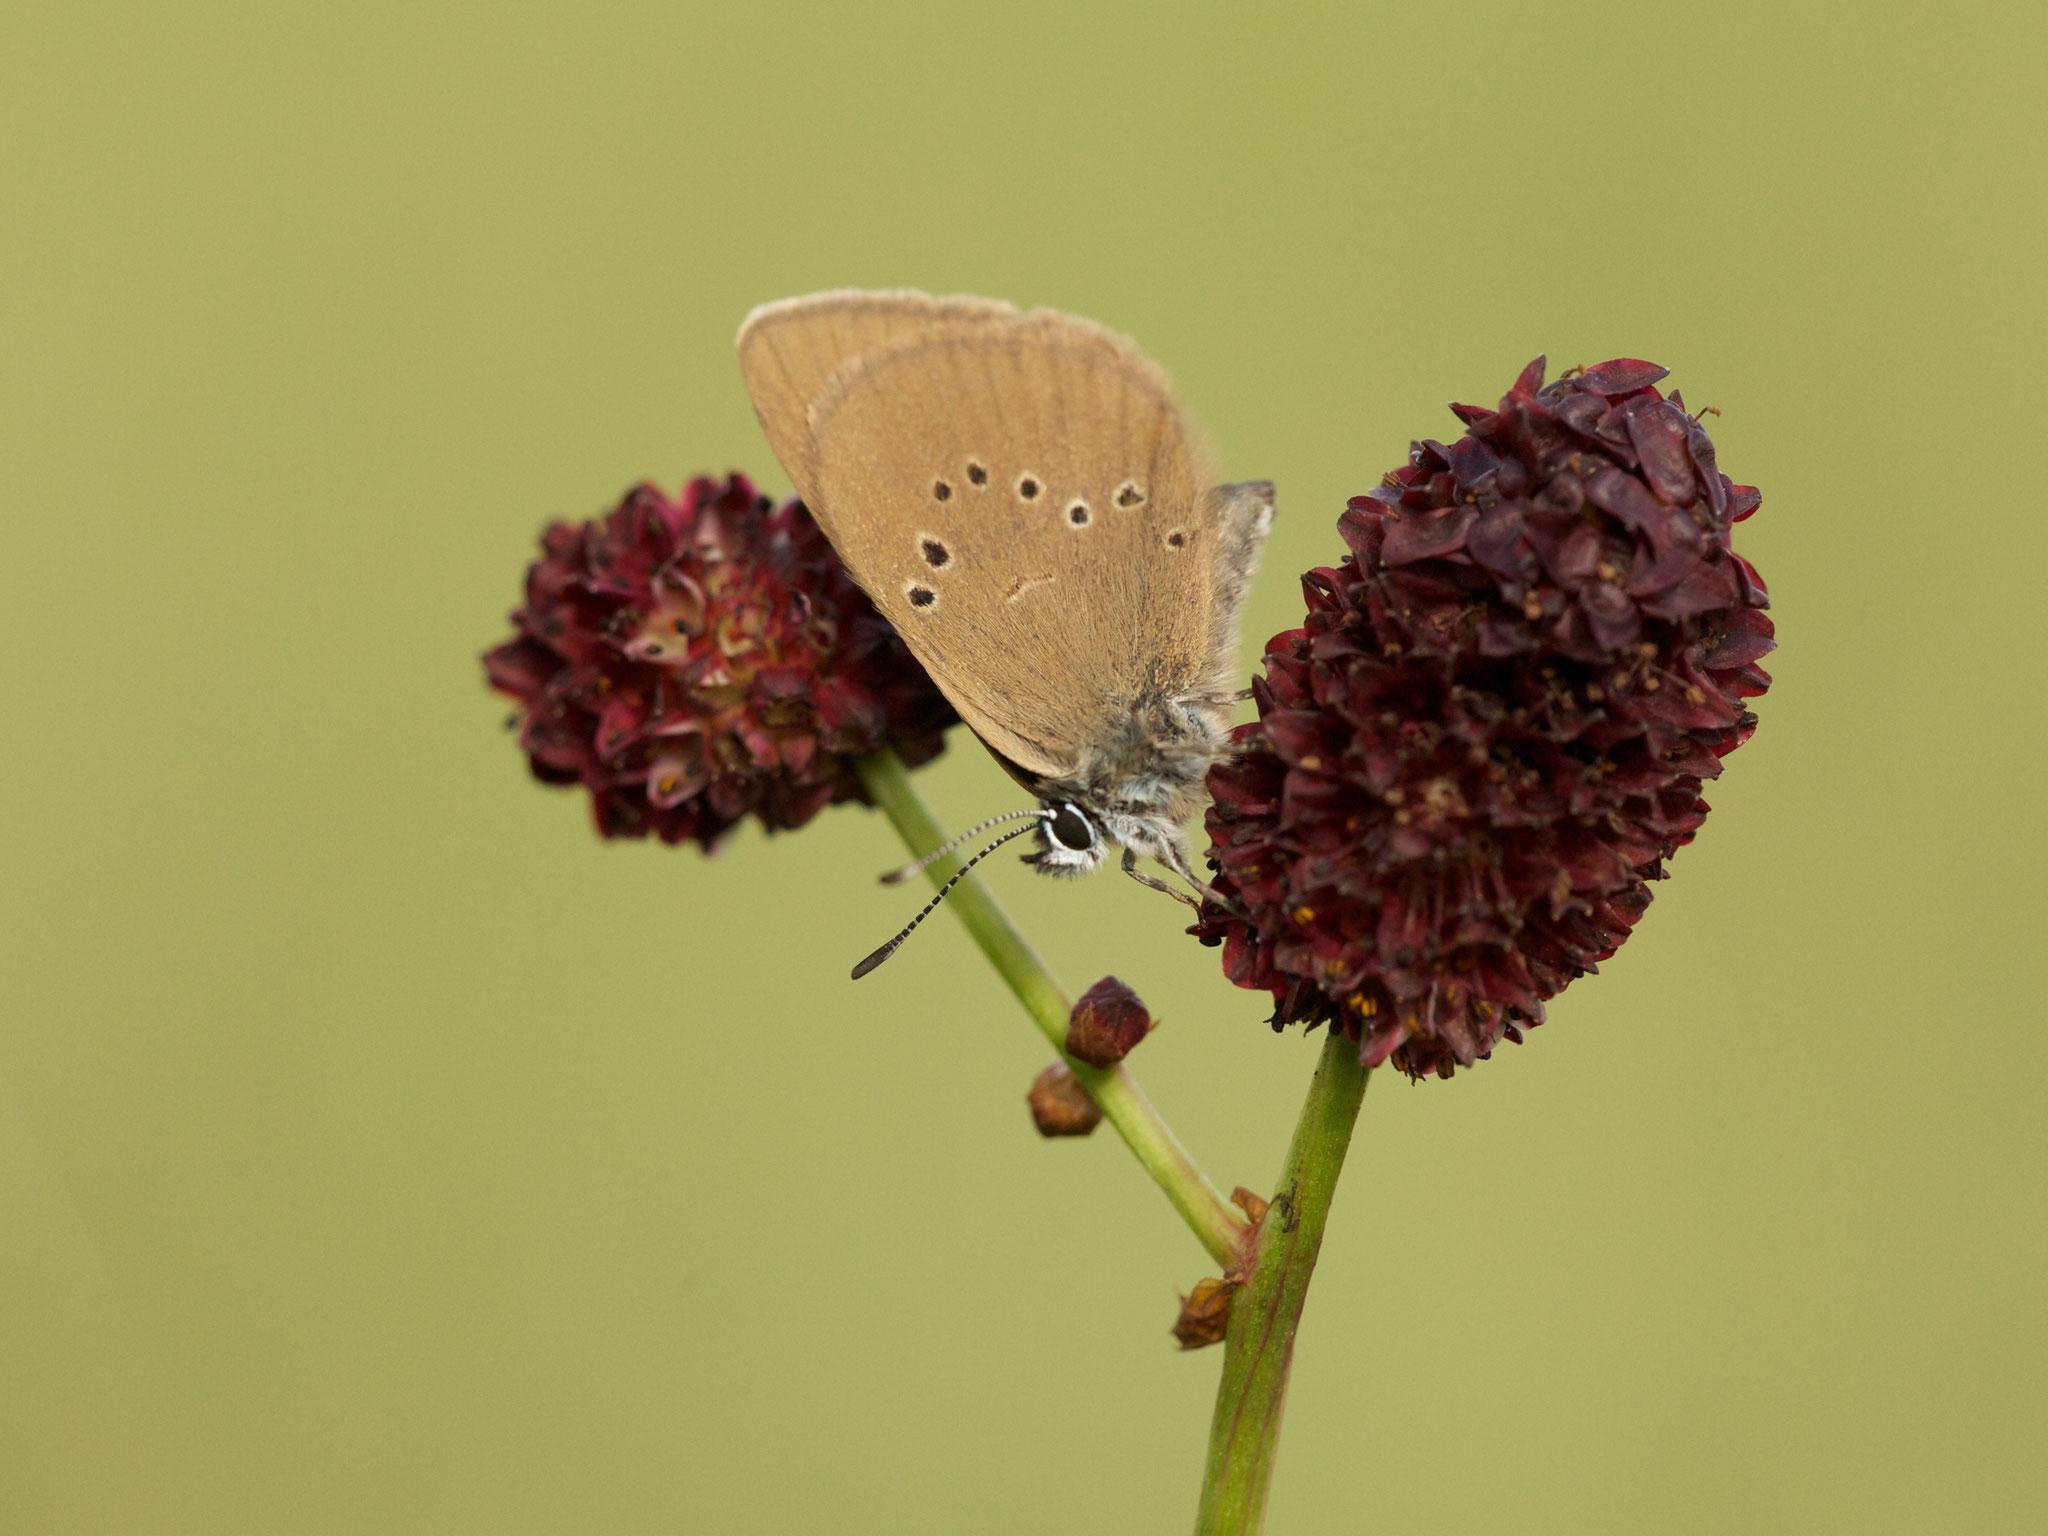 Dunkler Wiesenknopf-Ameisenbläuling auf Blüte des Großen Wiesenknopf (Sanguisorba major) - Foto: NABU/C. Kasulke